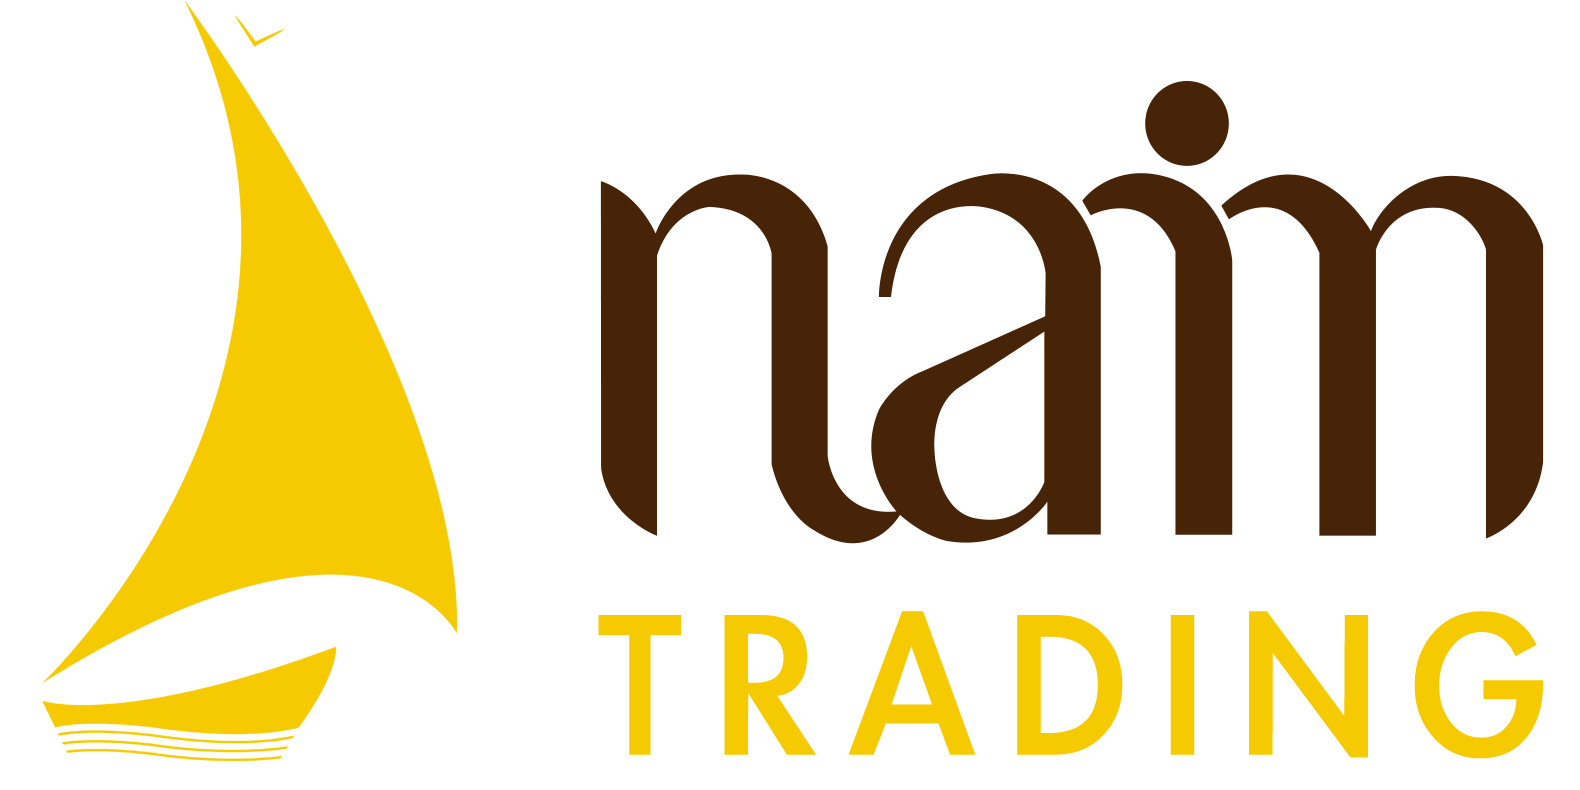 Nain-Schiffsmodelle